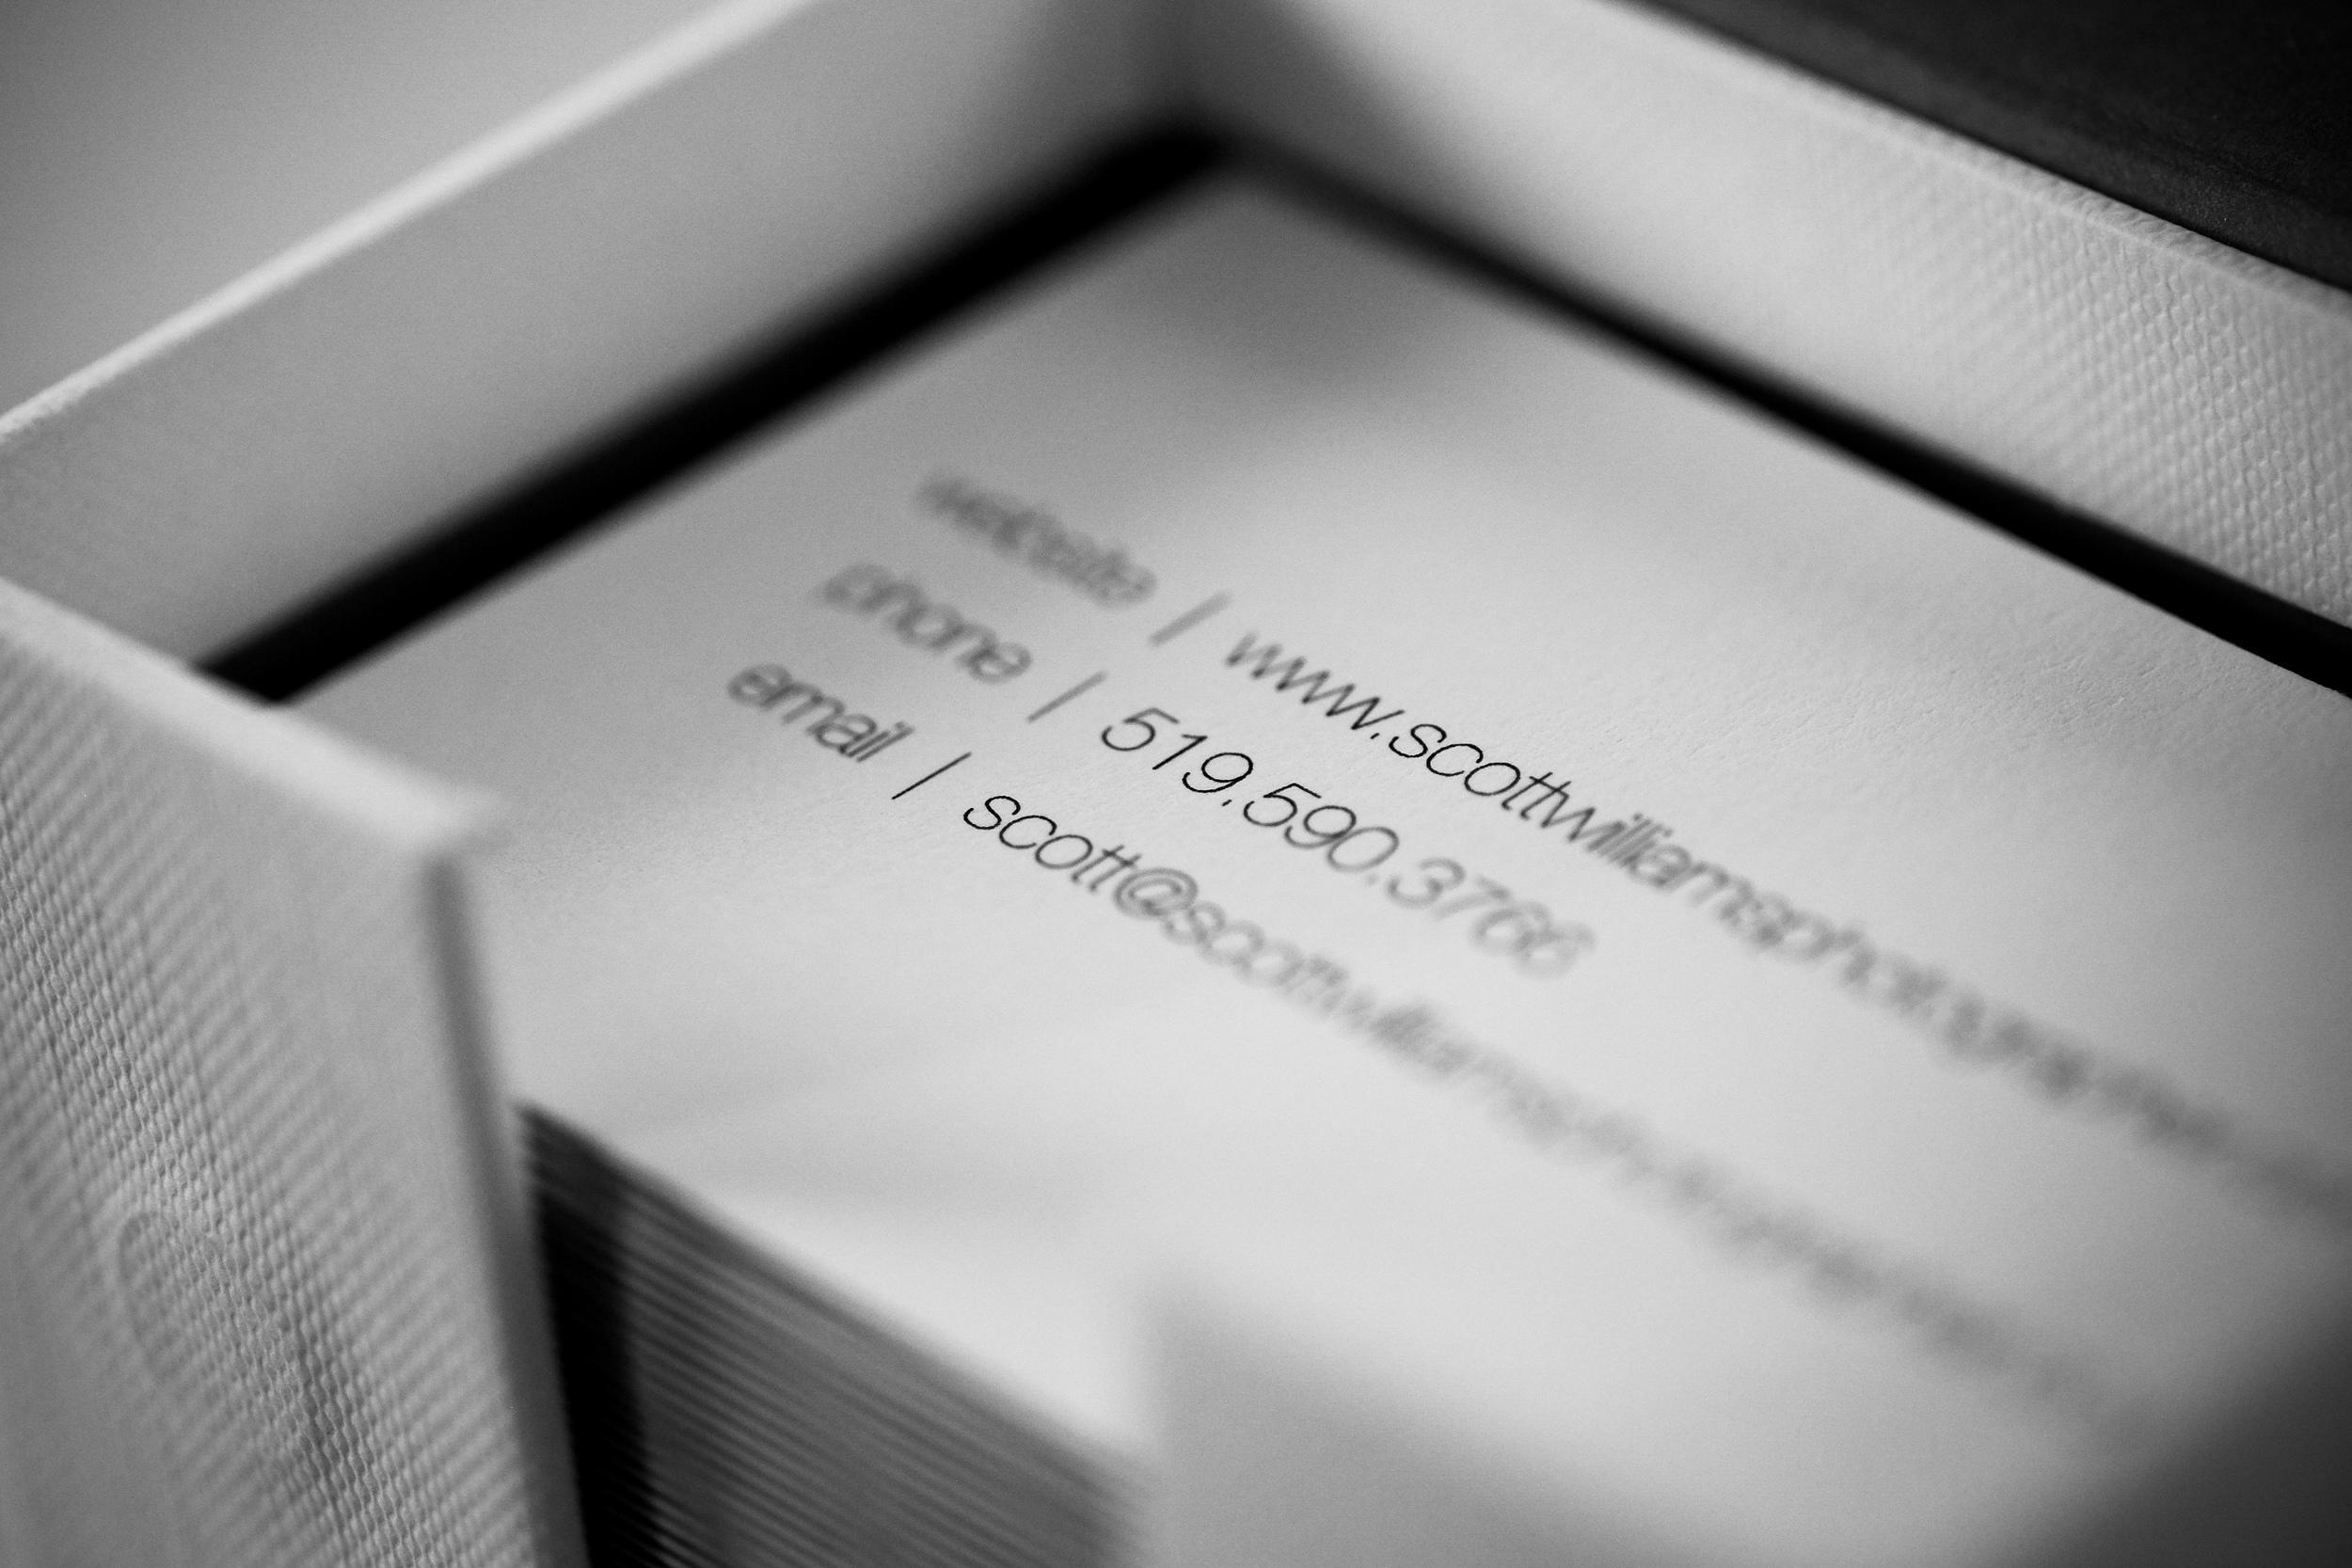 scott-williams-photographer-business-cards-006.jpg